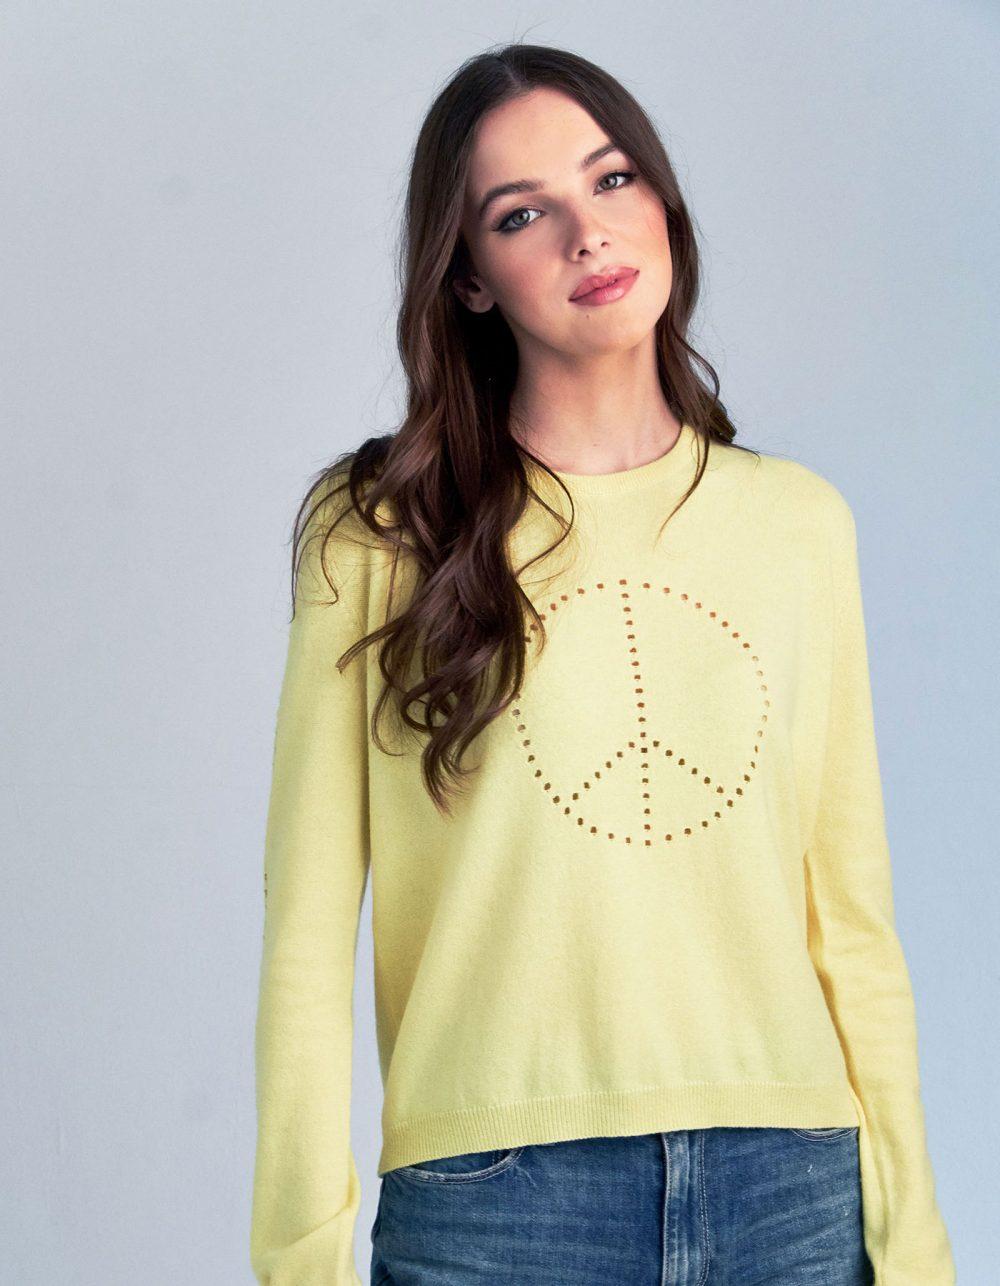 Studio photograph of a woman wearing a malin darlin Peace cashmere jumper.